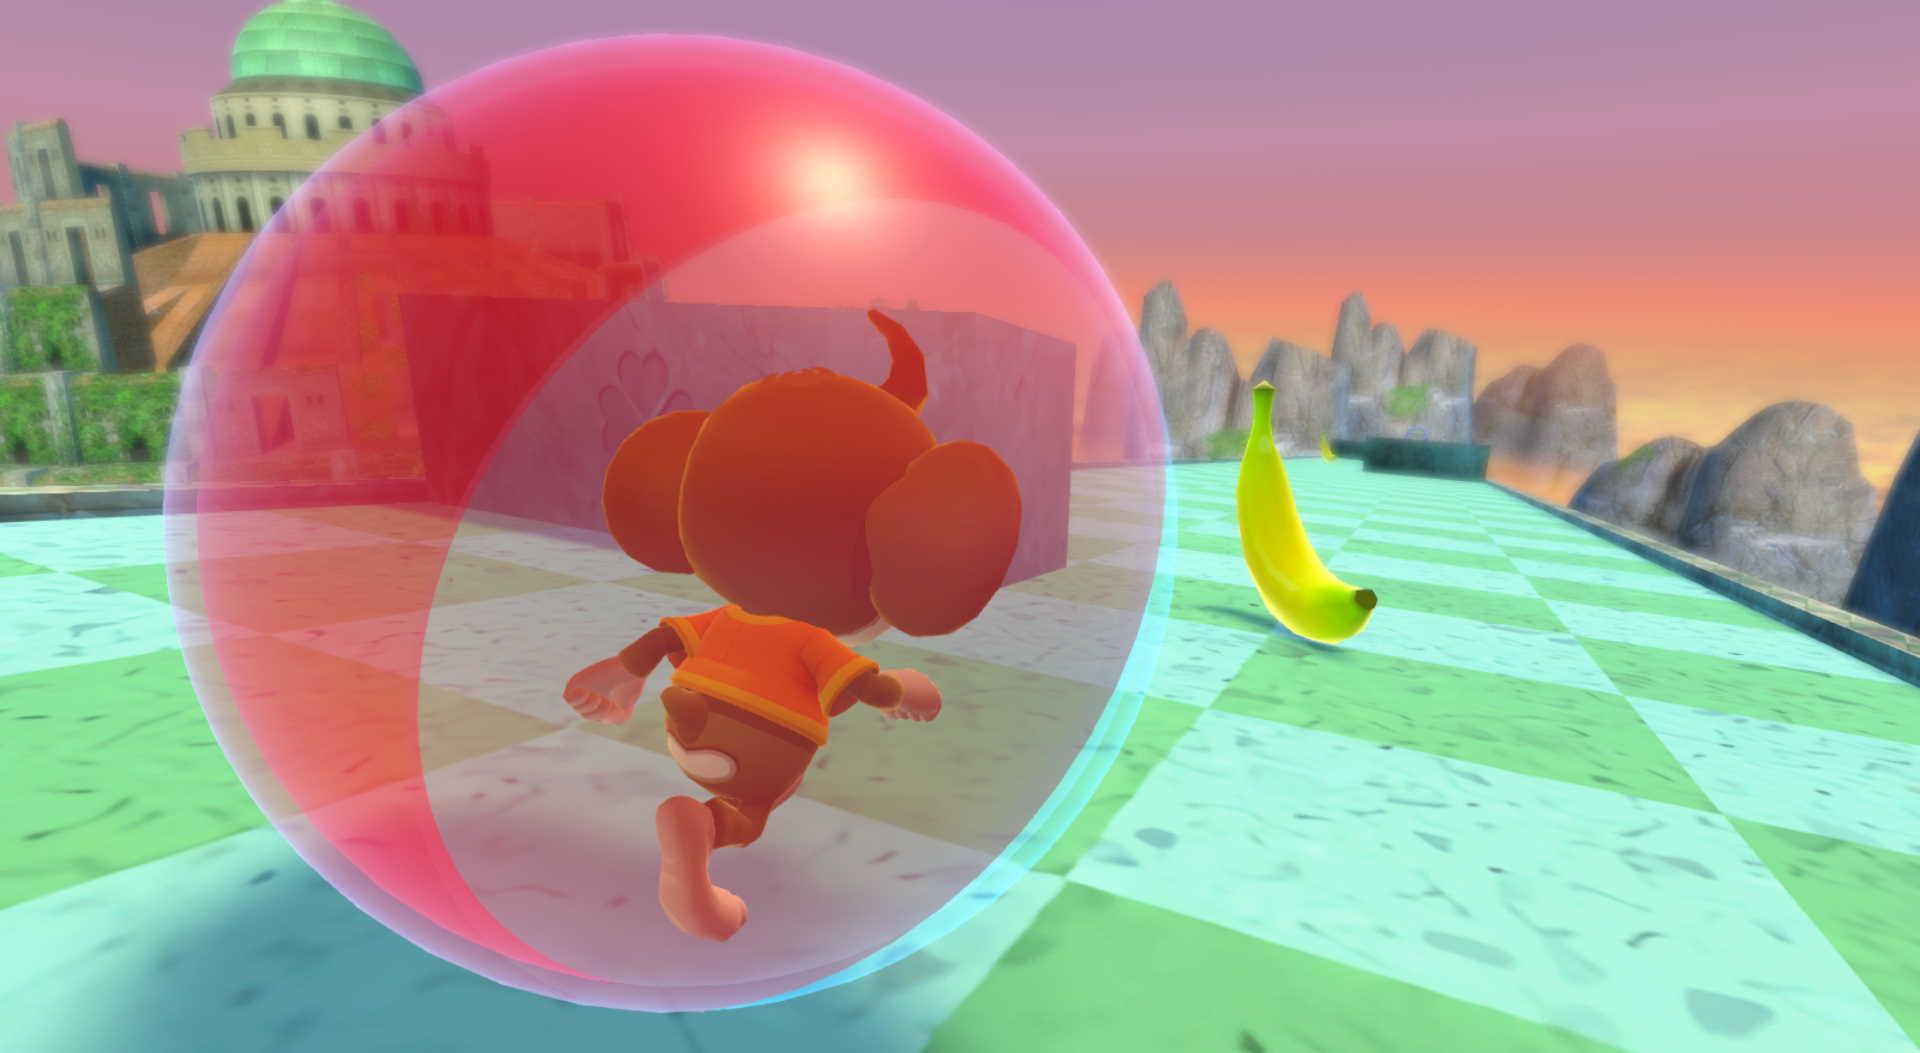 Super Monkey Ball: Banana Mania: simple but effective